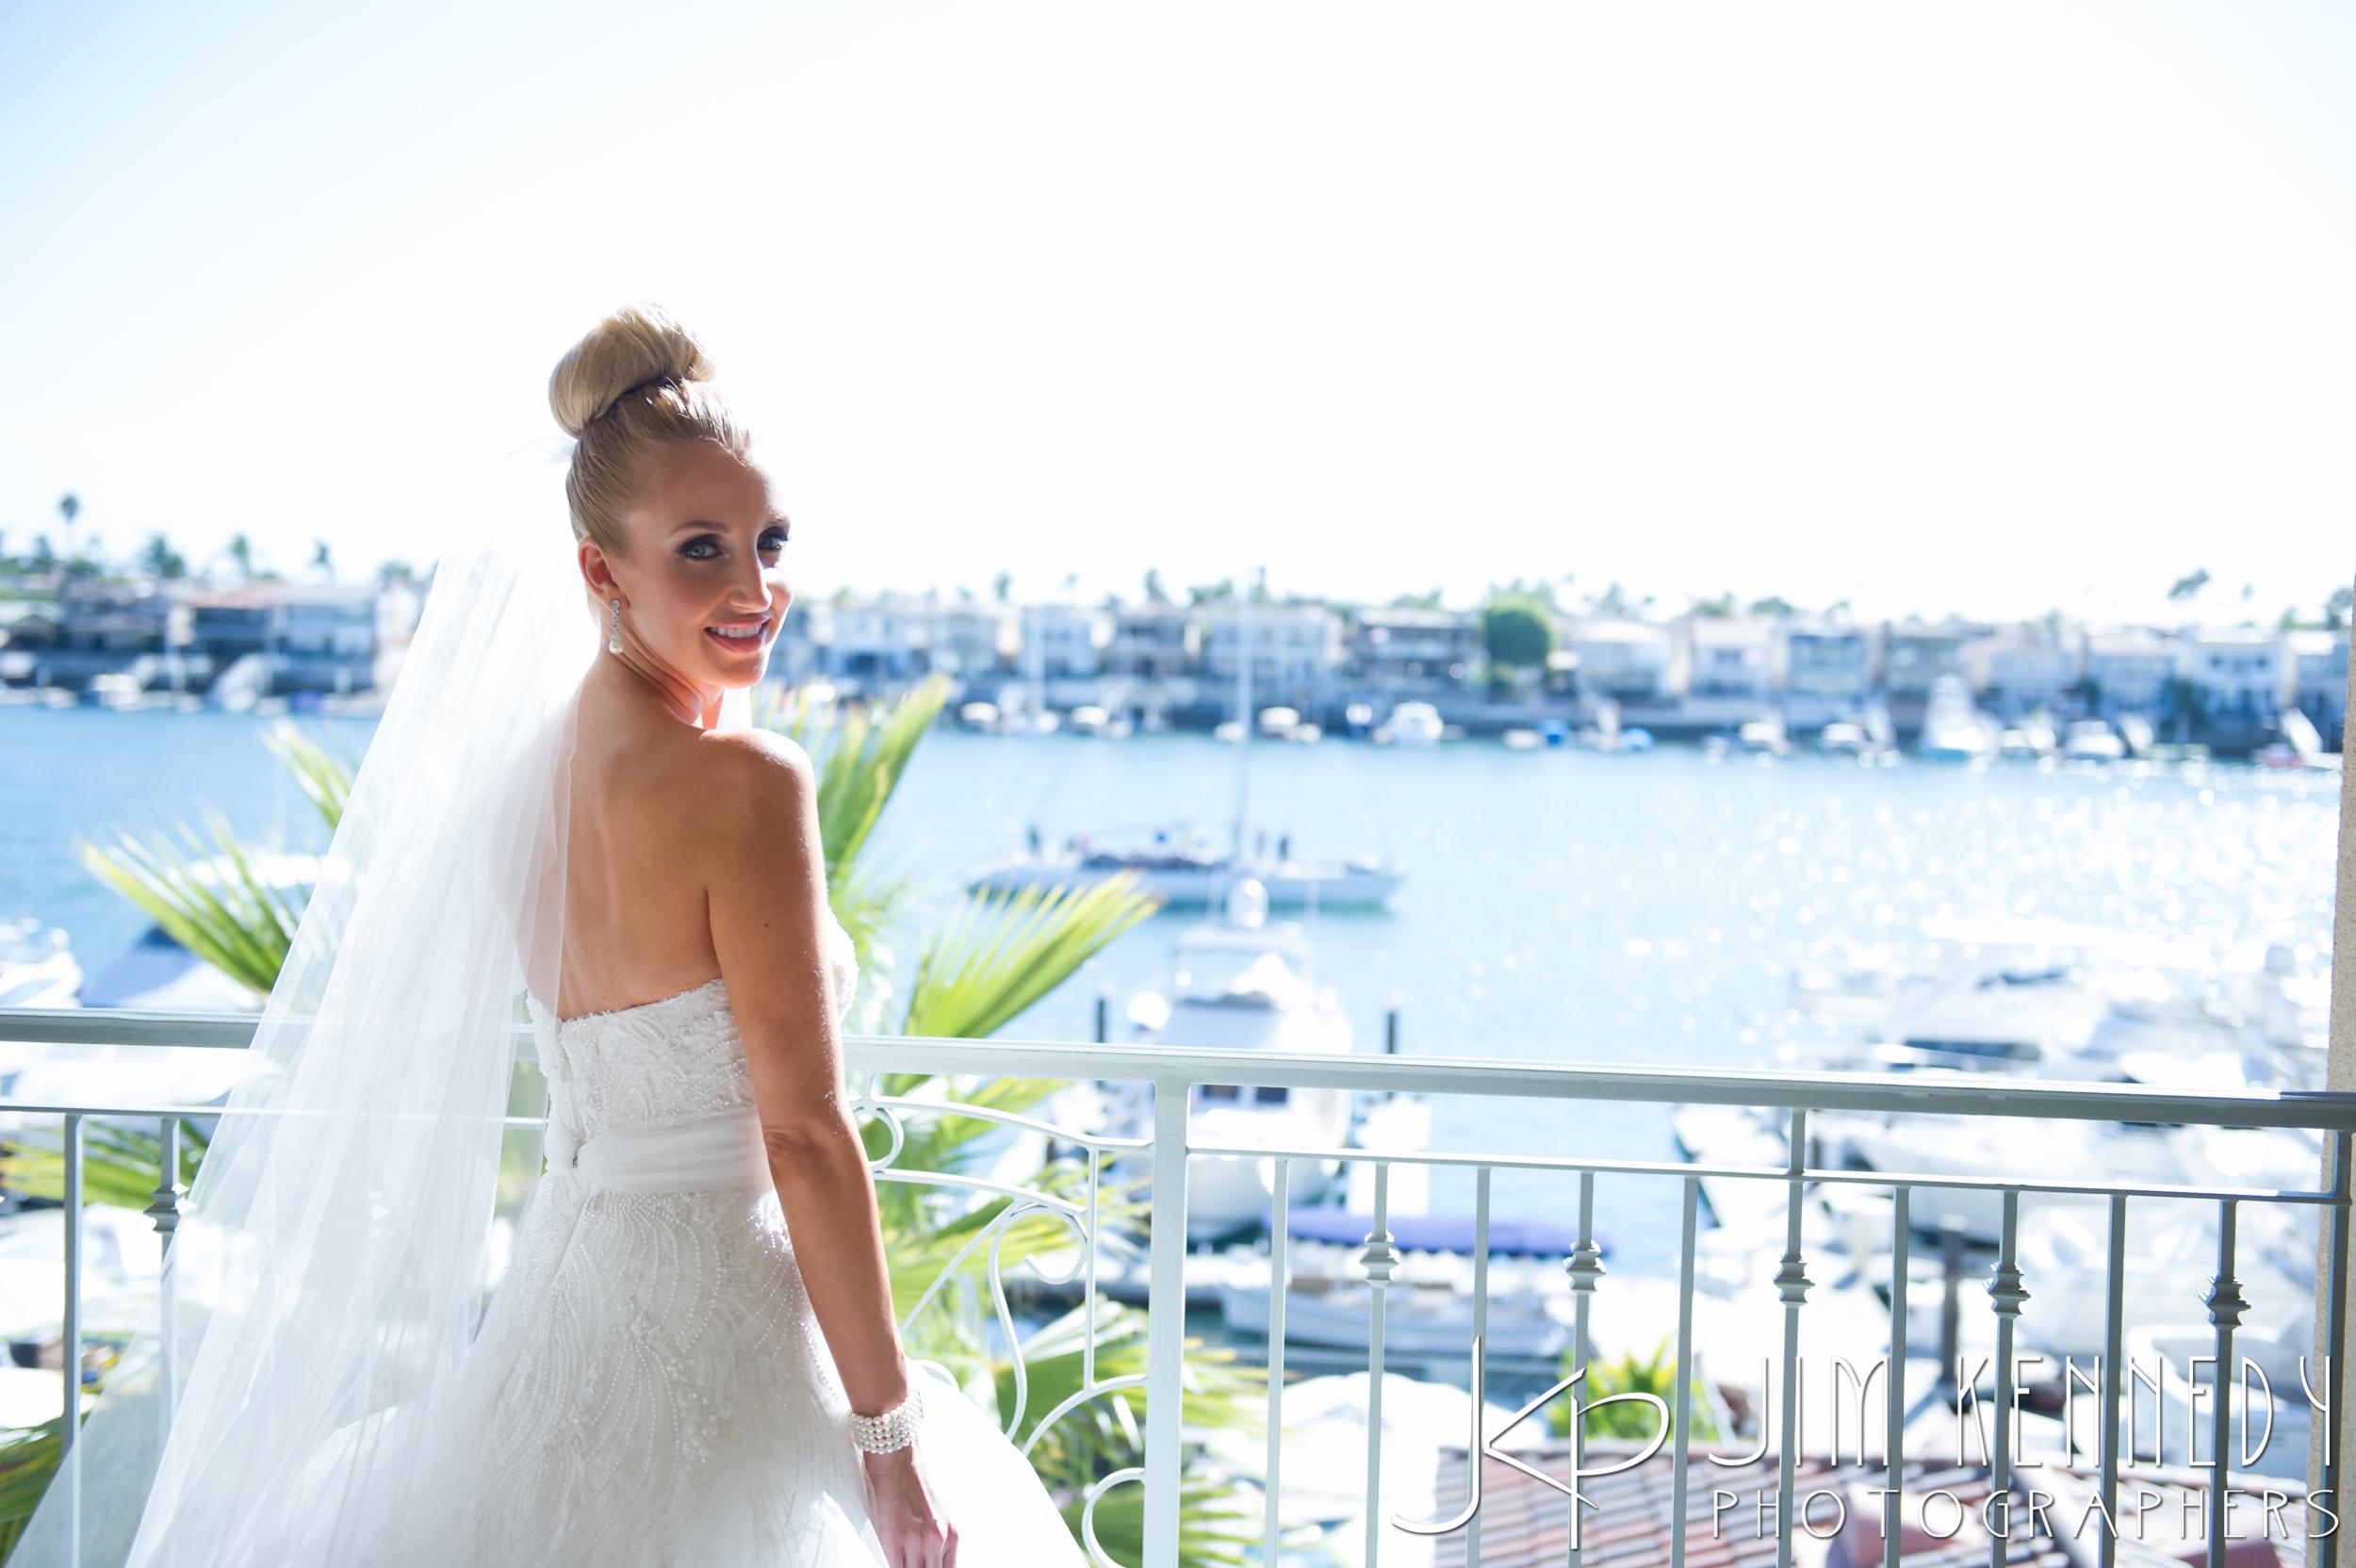 balboa-bay-resort-wedding-photography_0030.JPG